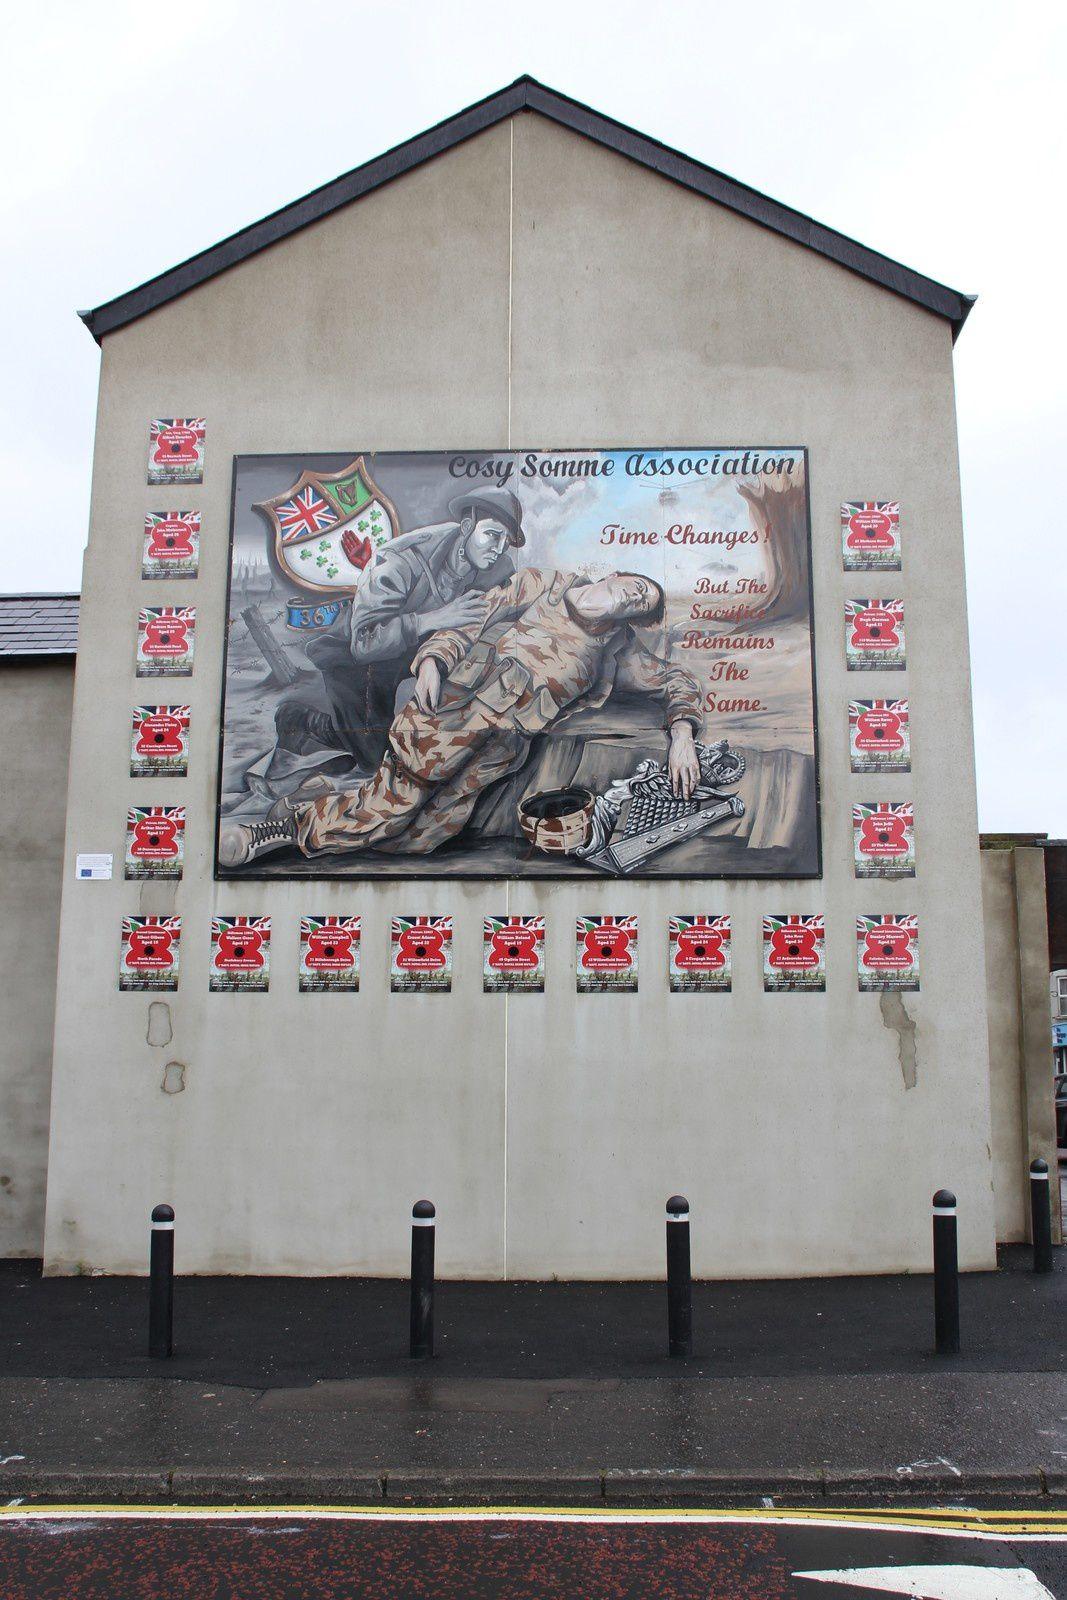 776) Castlereagh Road, South Belfast